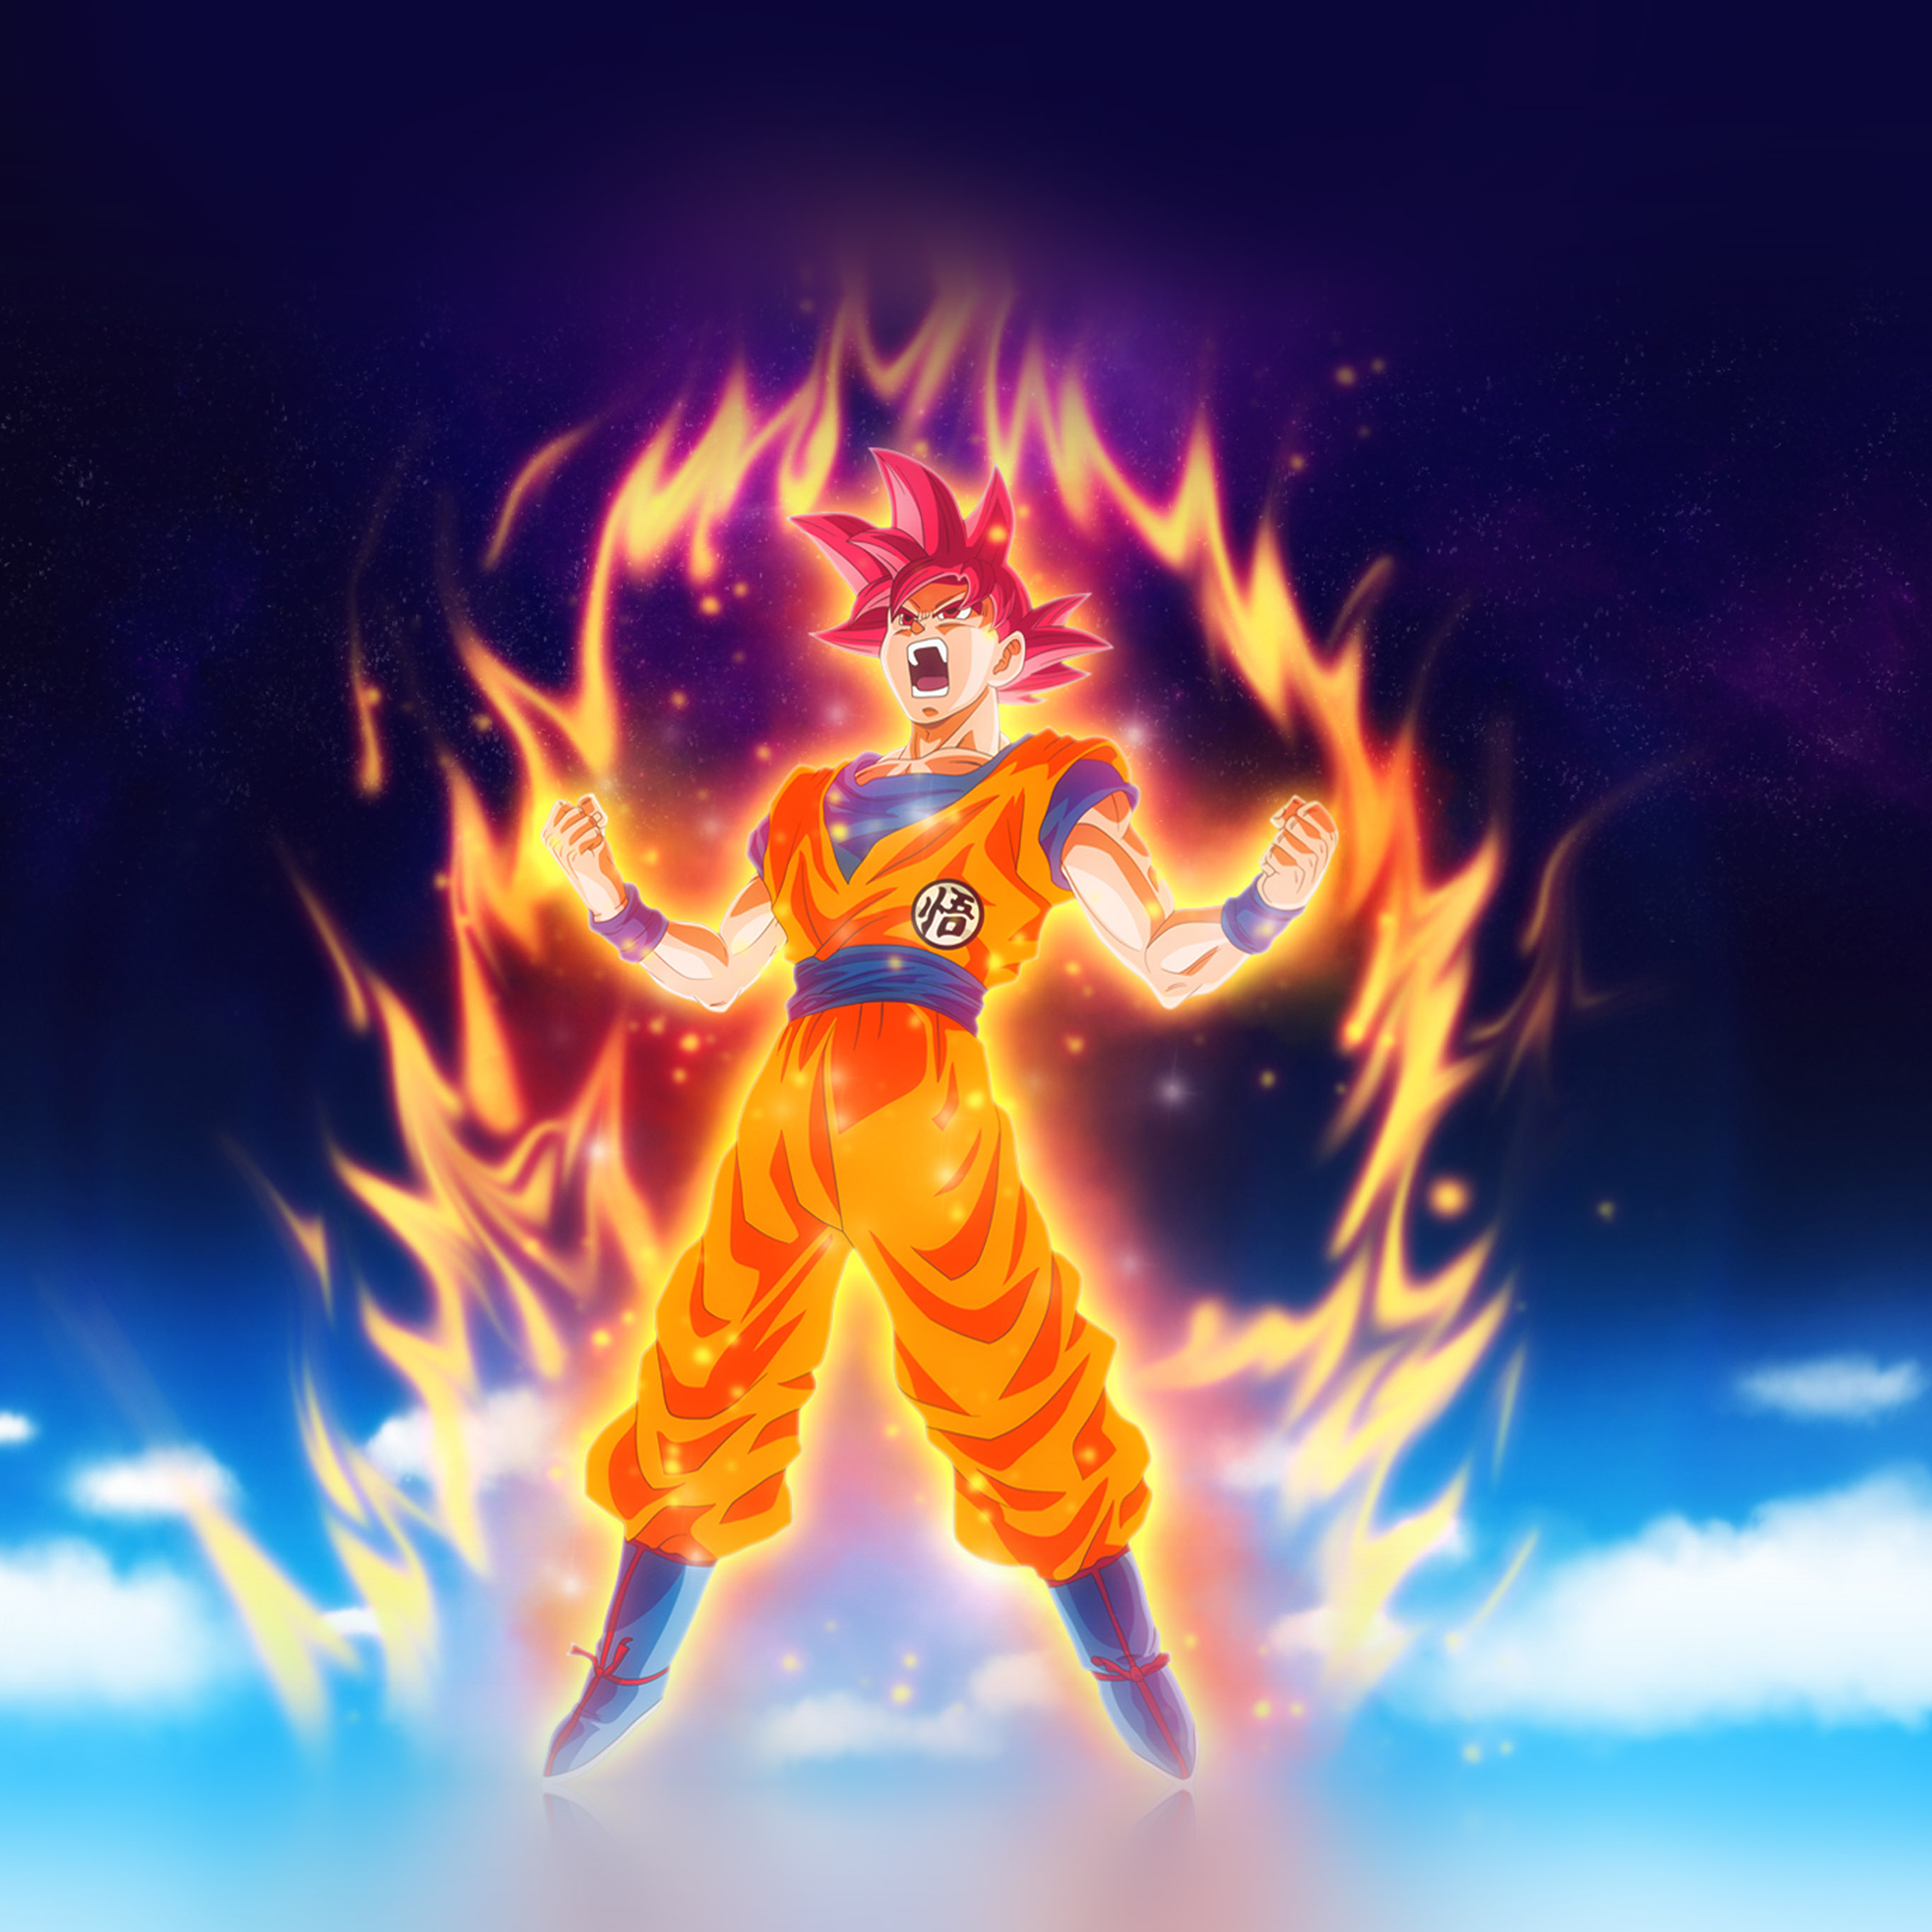 Dragon Ball Z Wallpaper Iphone 7 2732x2732 Wallpaper Teahub Io